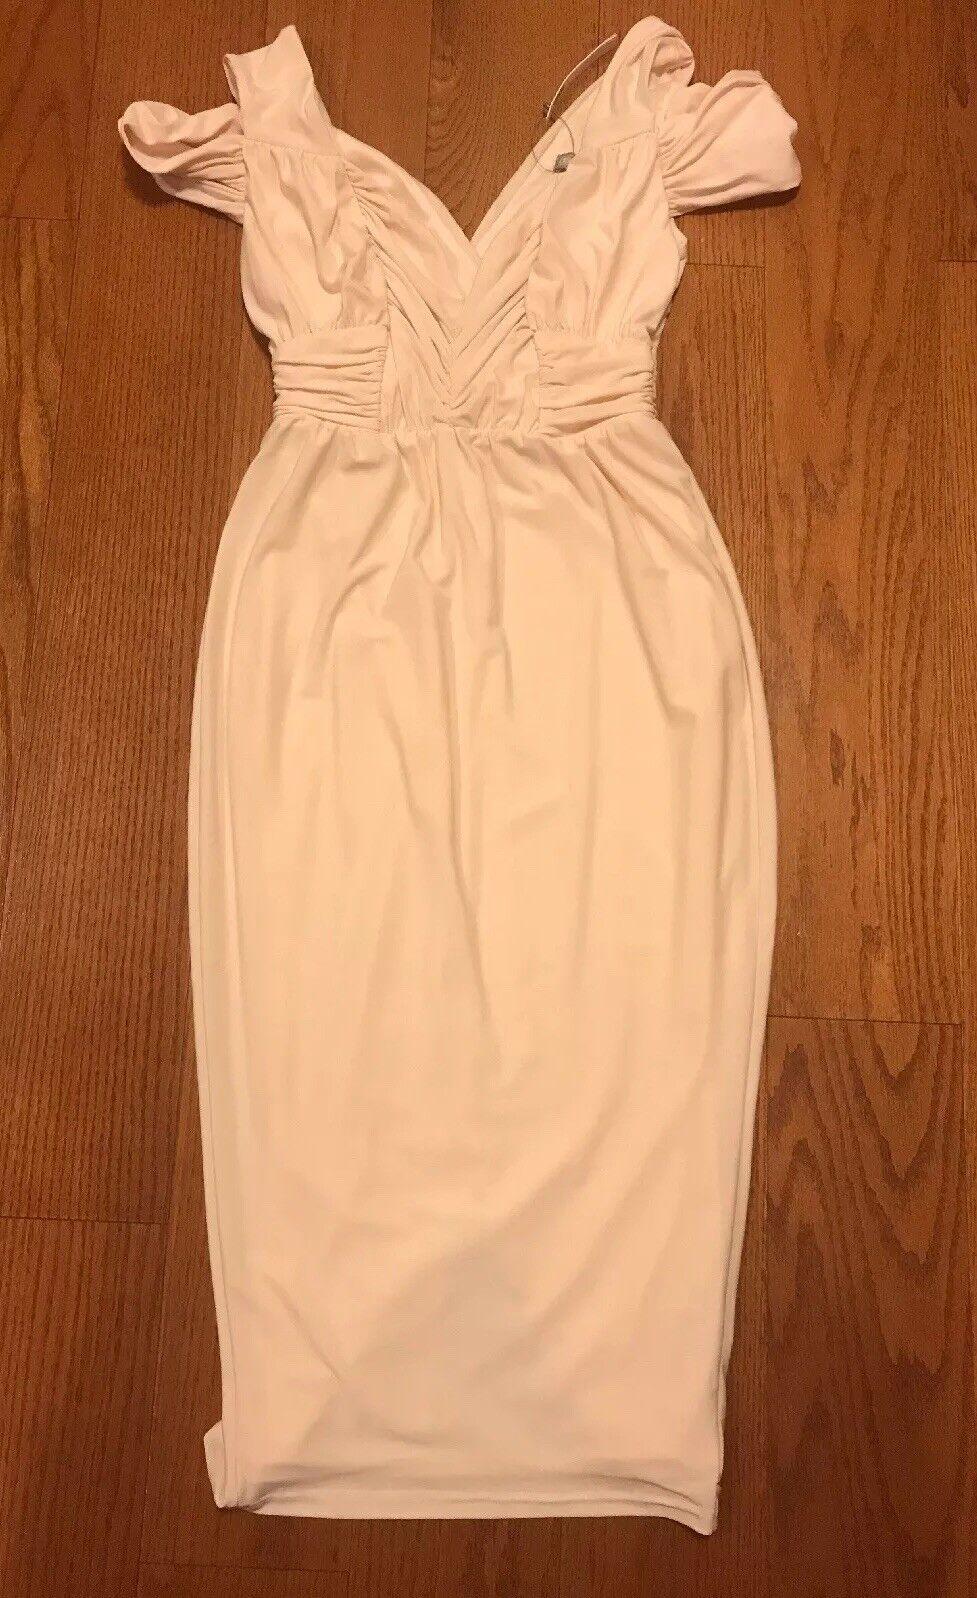 Asos bluesh Peach Nude color, Off Shoulder Midi Dress Sz. 0 NWT